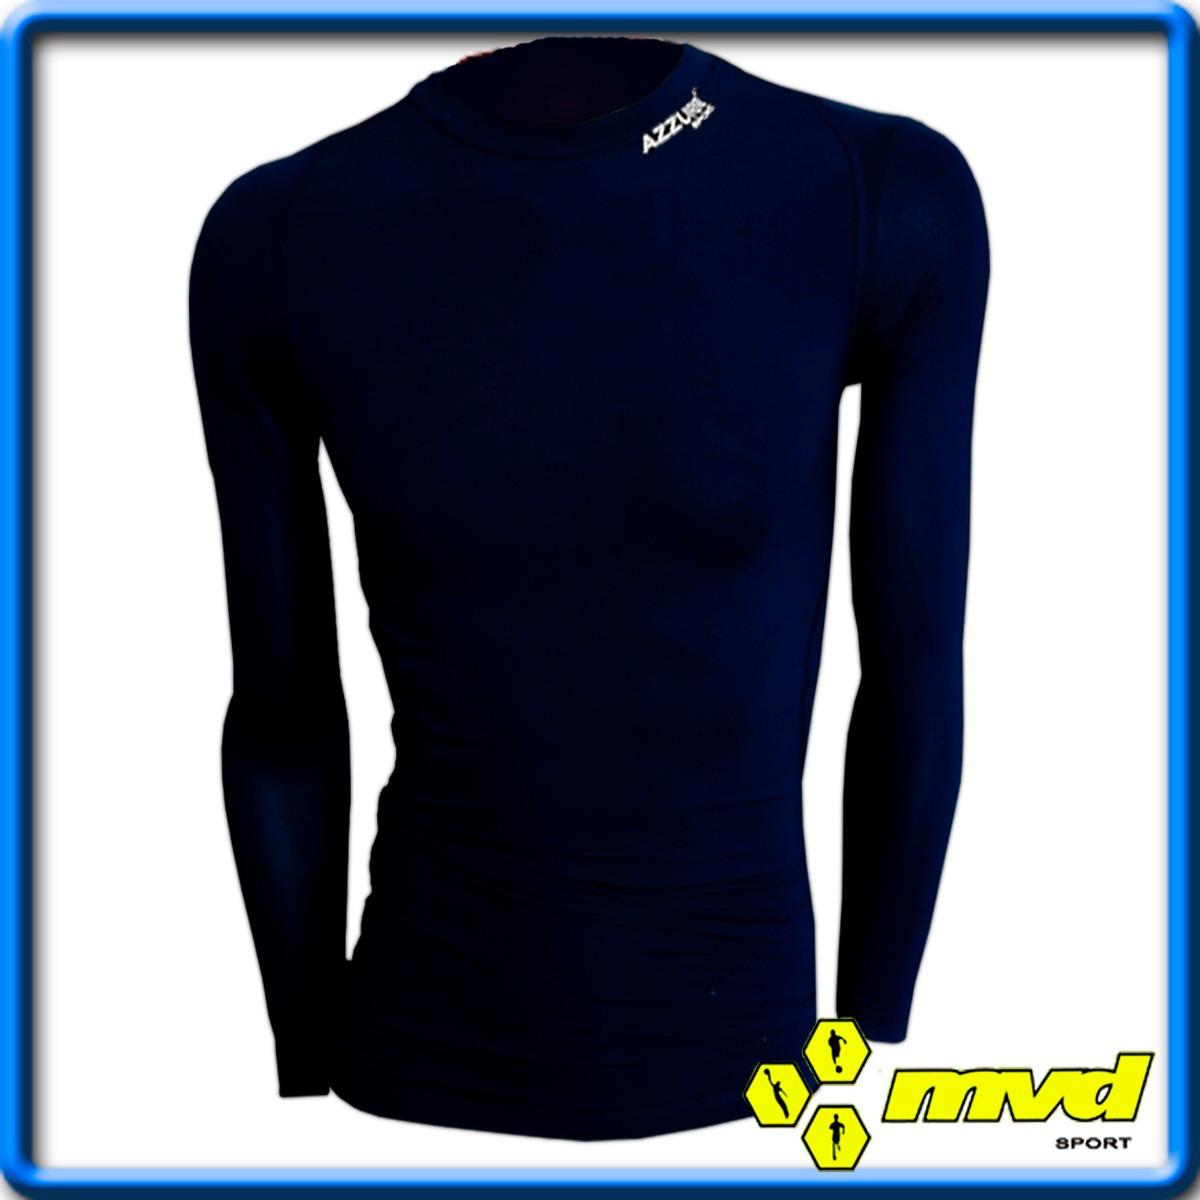 Camiseta Térmica Fútbol Todos Los Deportes Tela Doble Piel ... f4aa6e15c6eb0